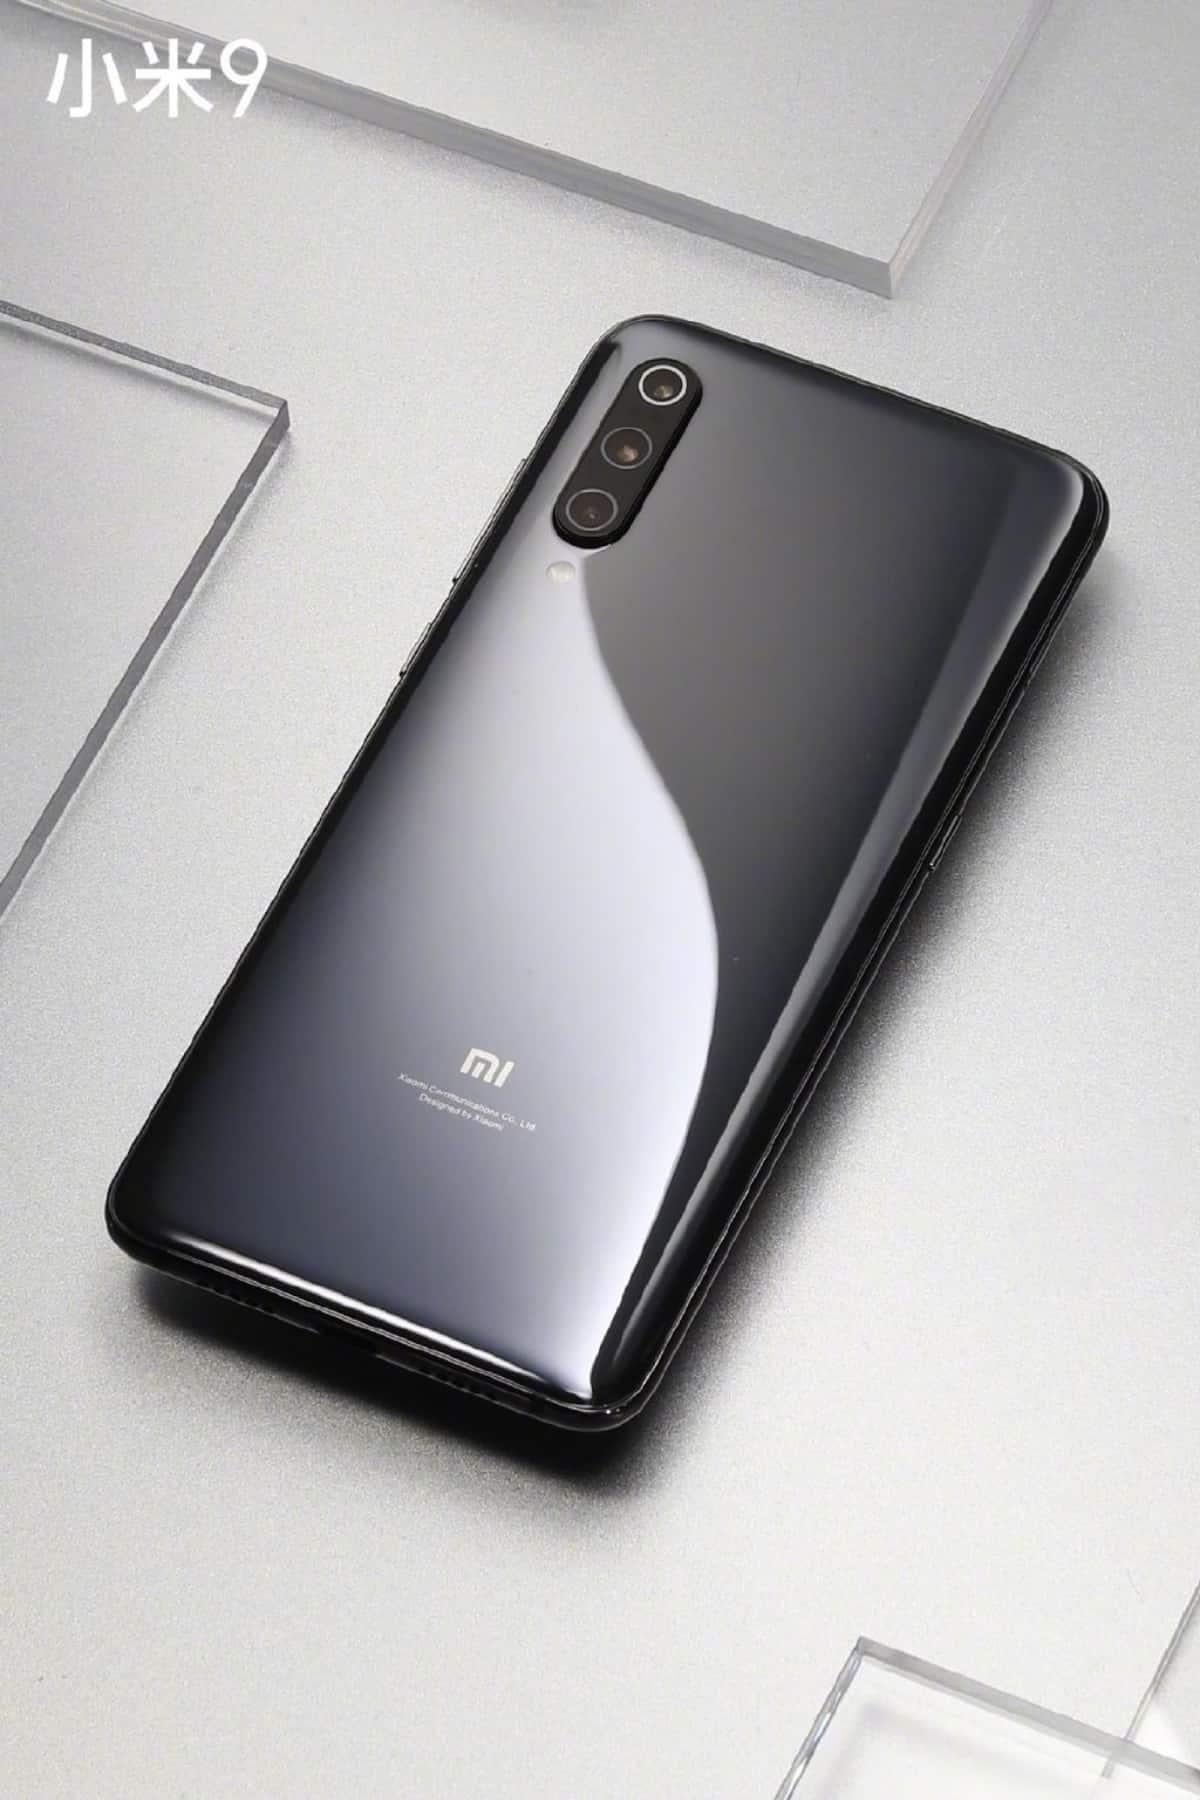 Xiaomi Mi 9 tem nova cor e o queixo 40% mais pequeno que o Mi 8